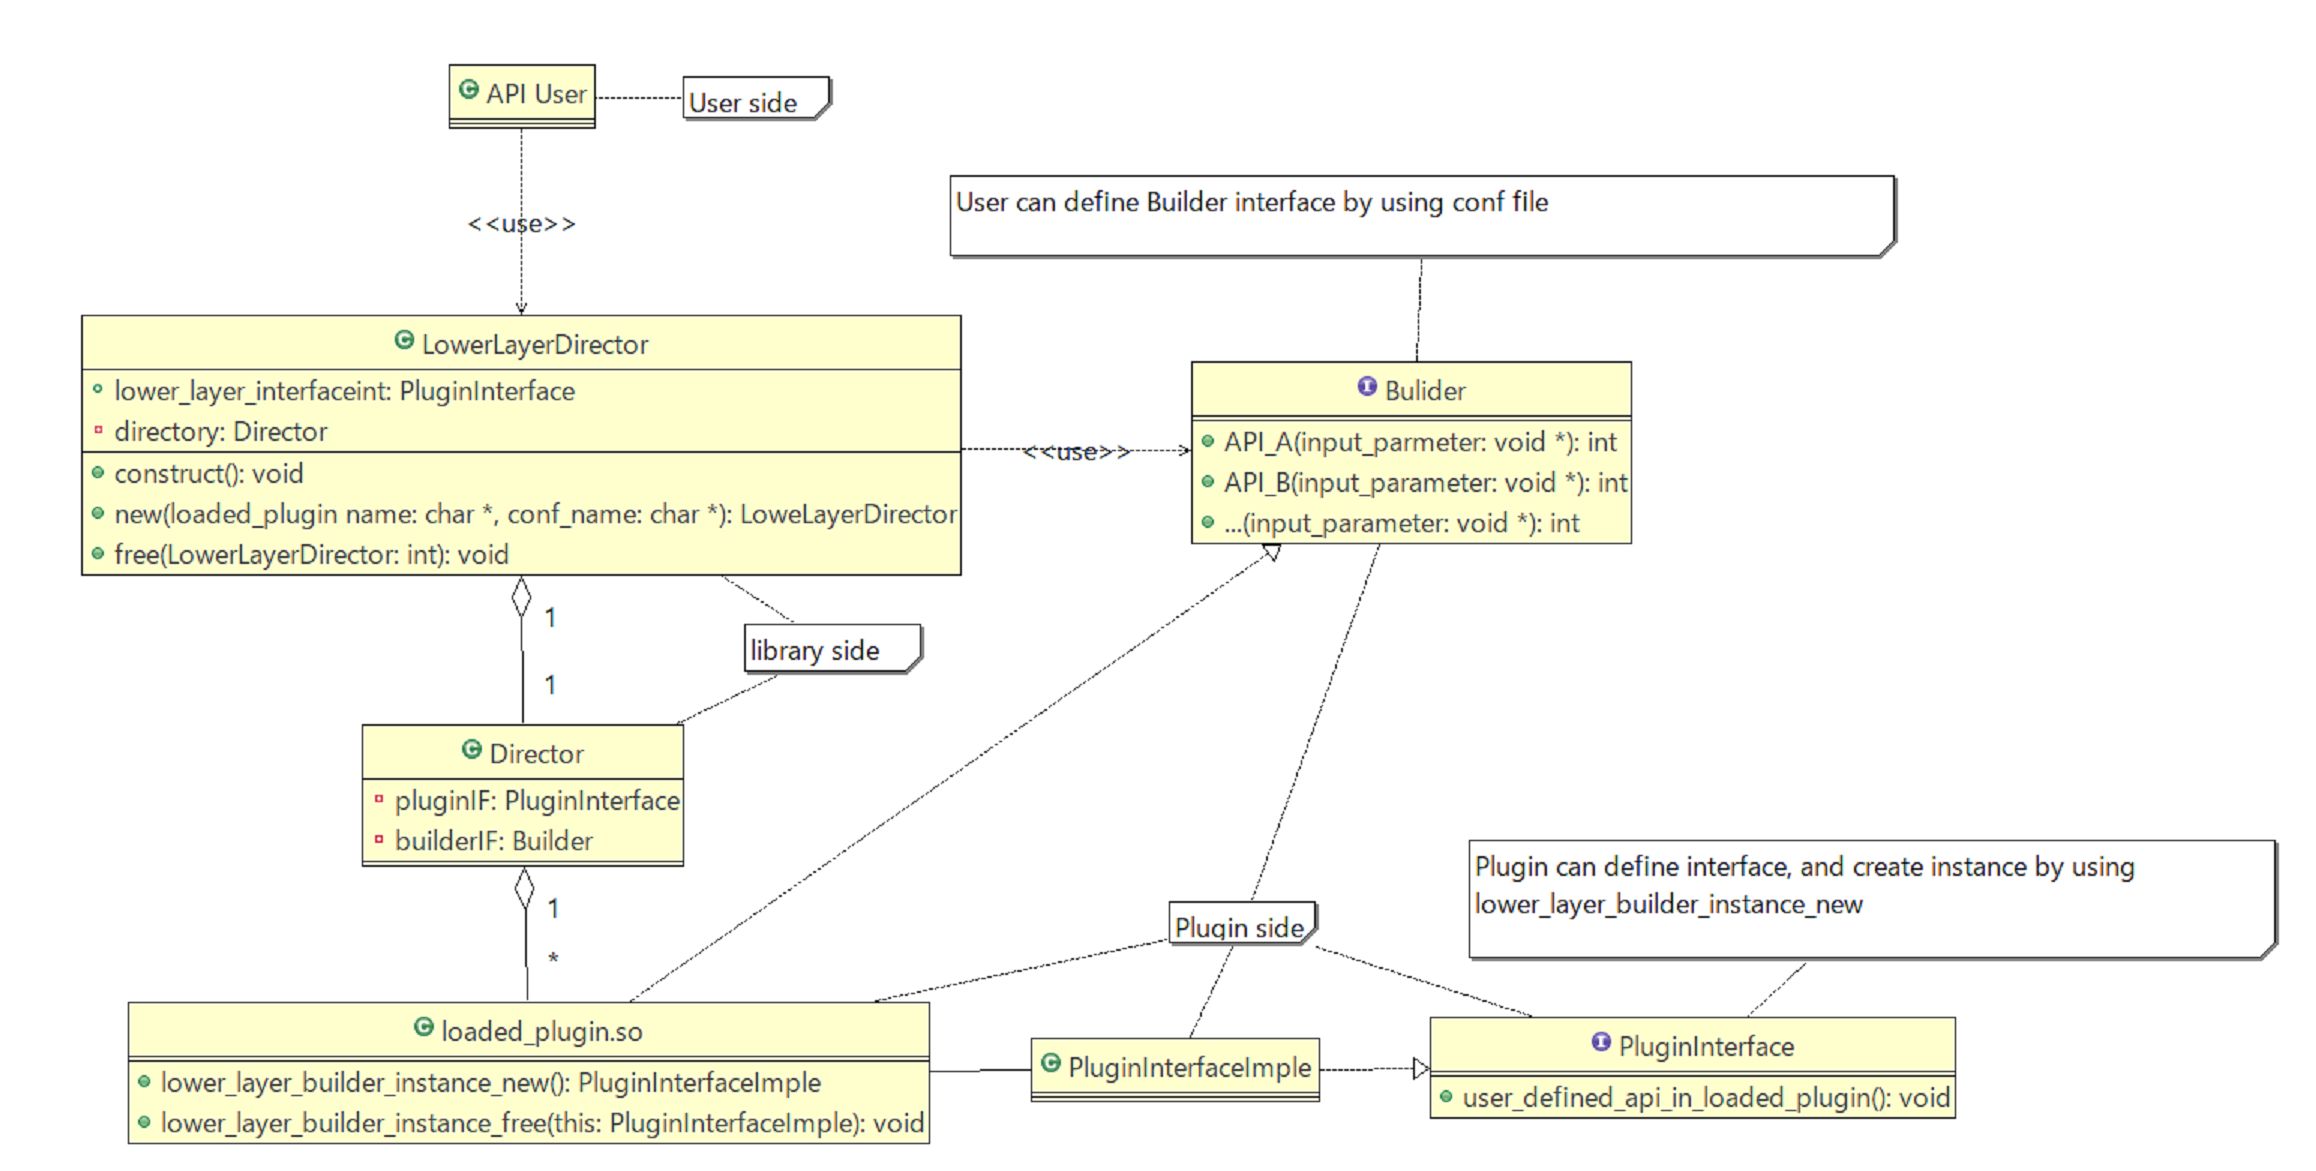 builder_lib_real.png